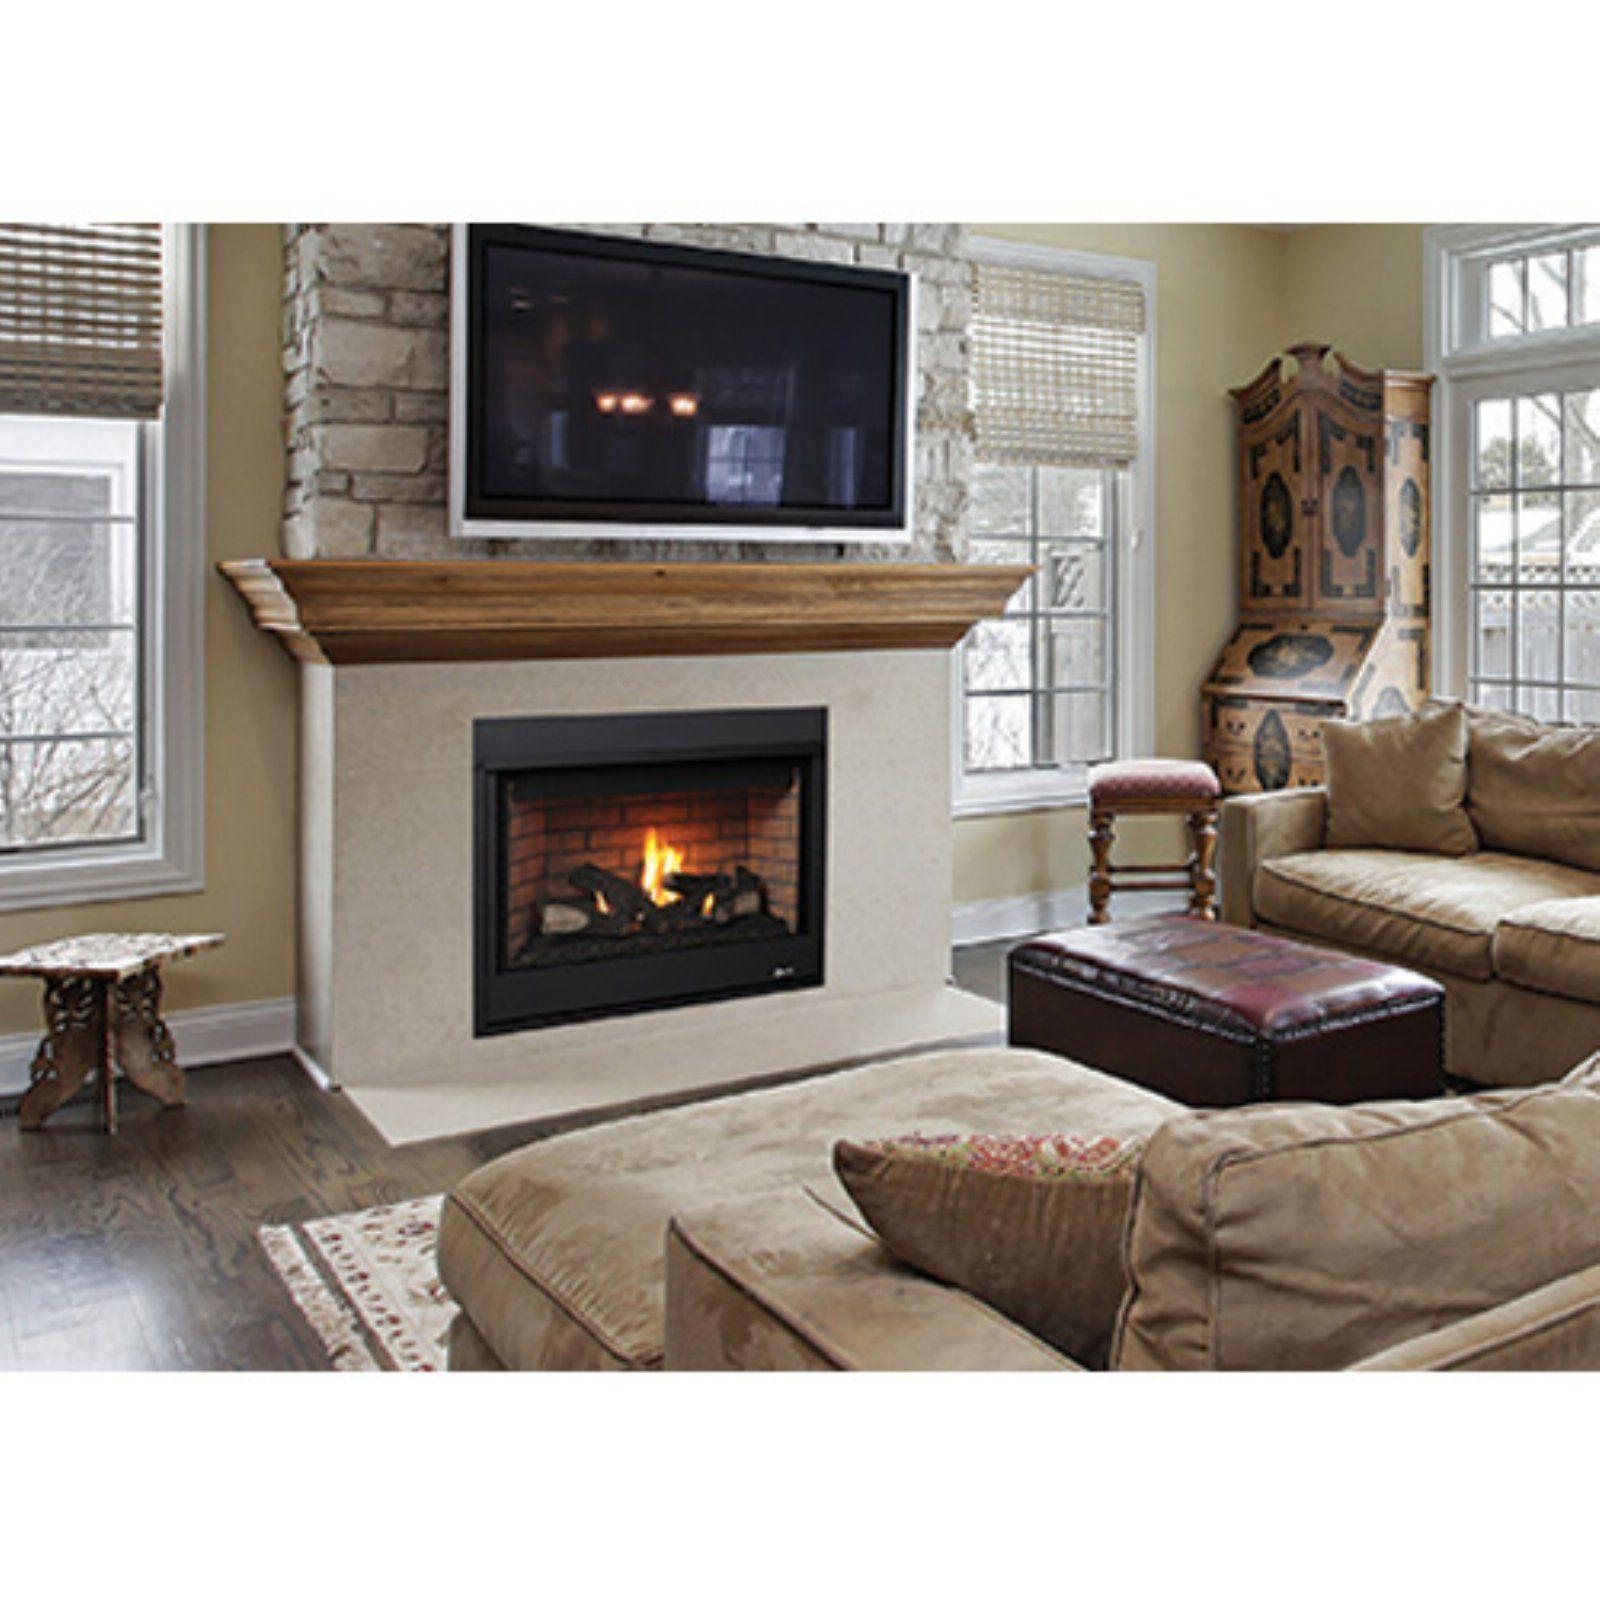 Superior Merit Series Traditional Gas Fireplace Insert | Gas fireplace insert, Vented gas ...